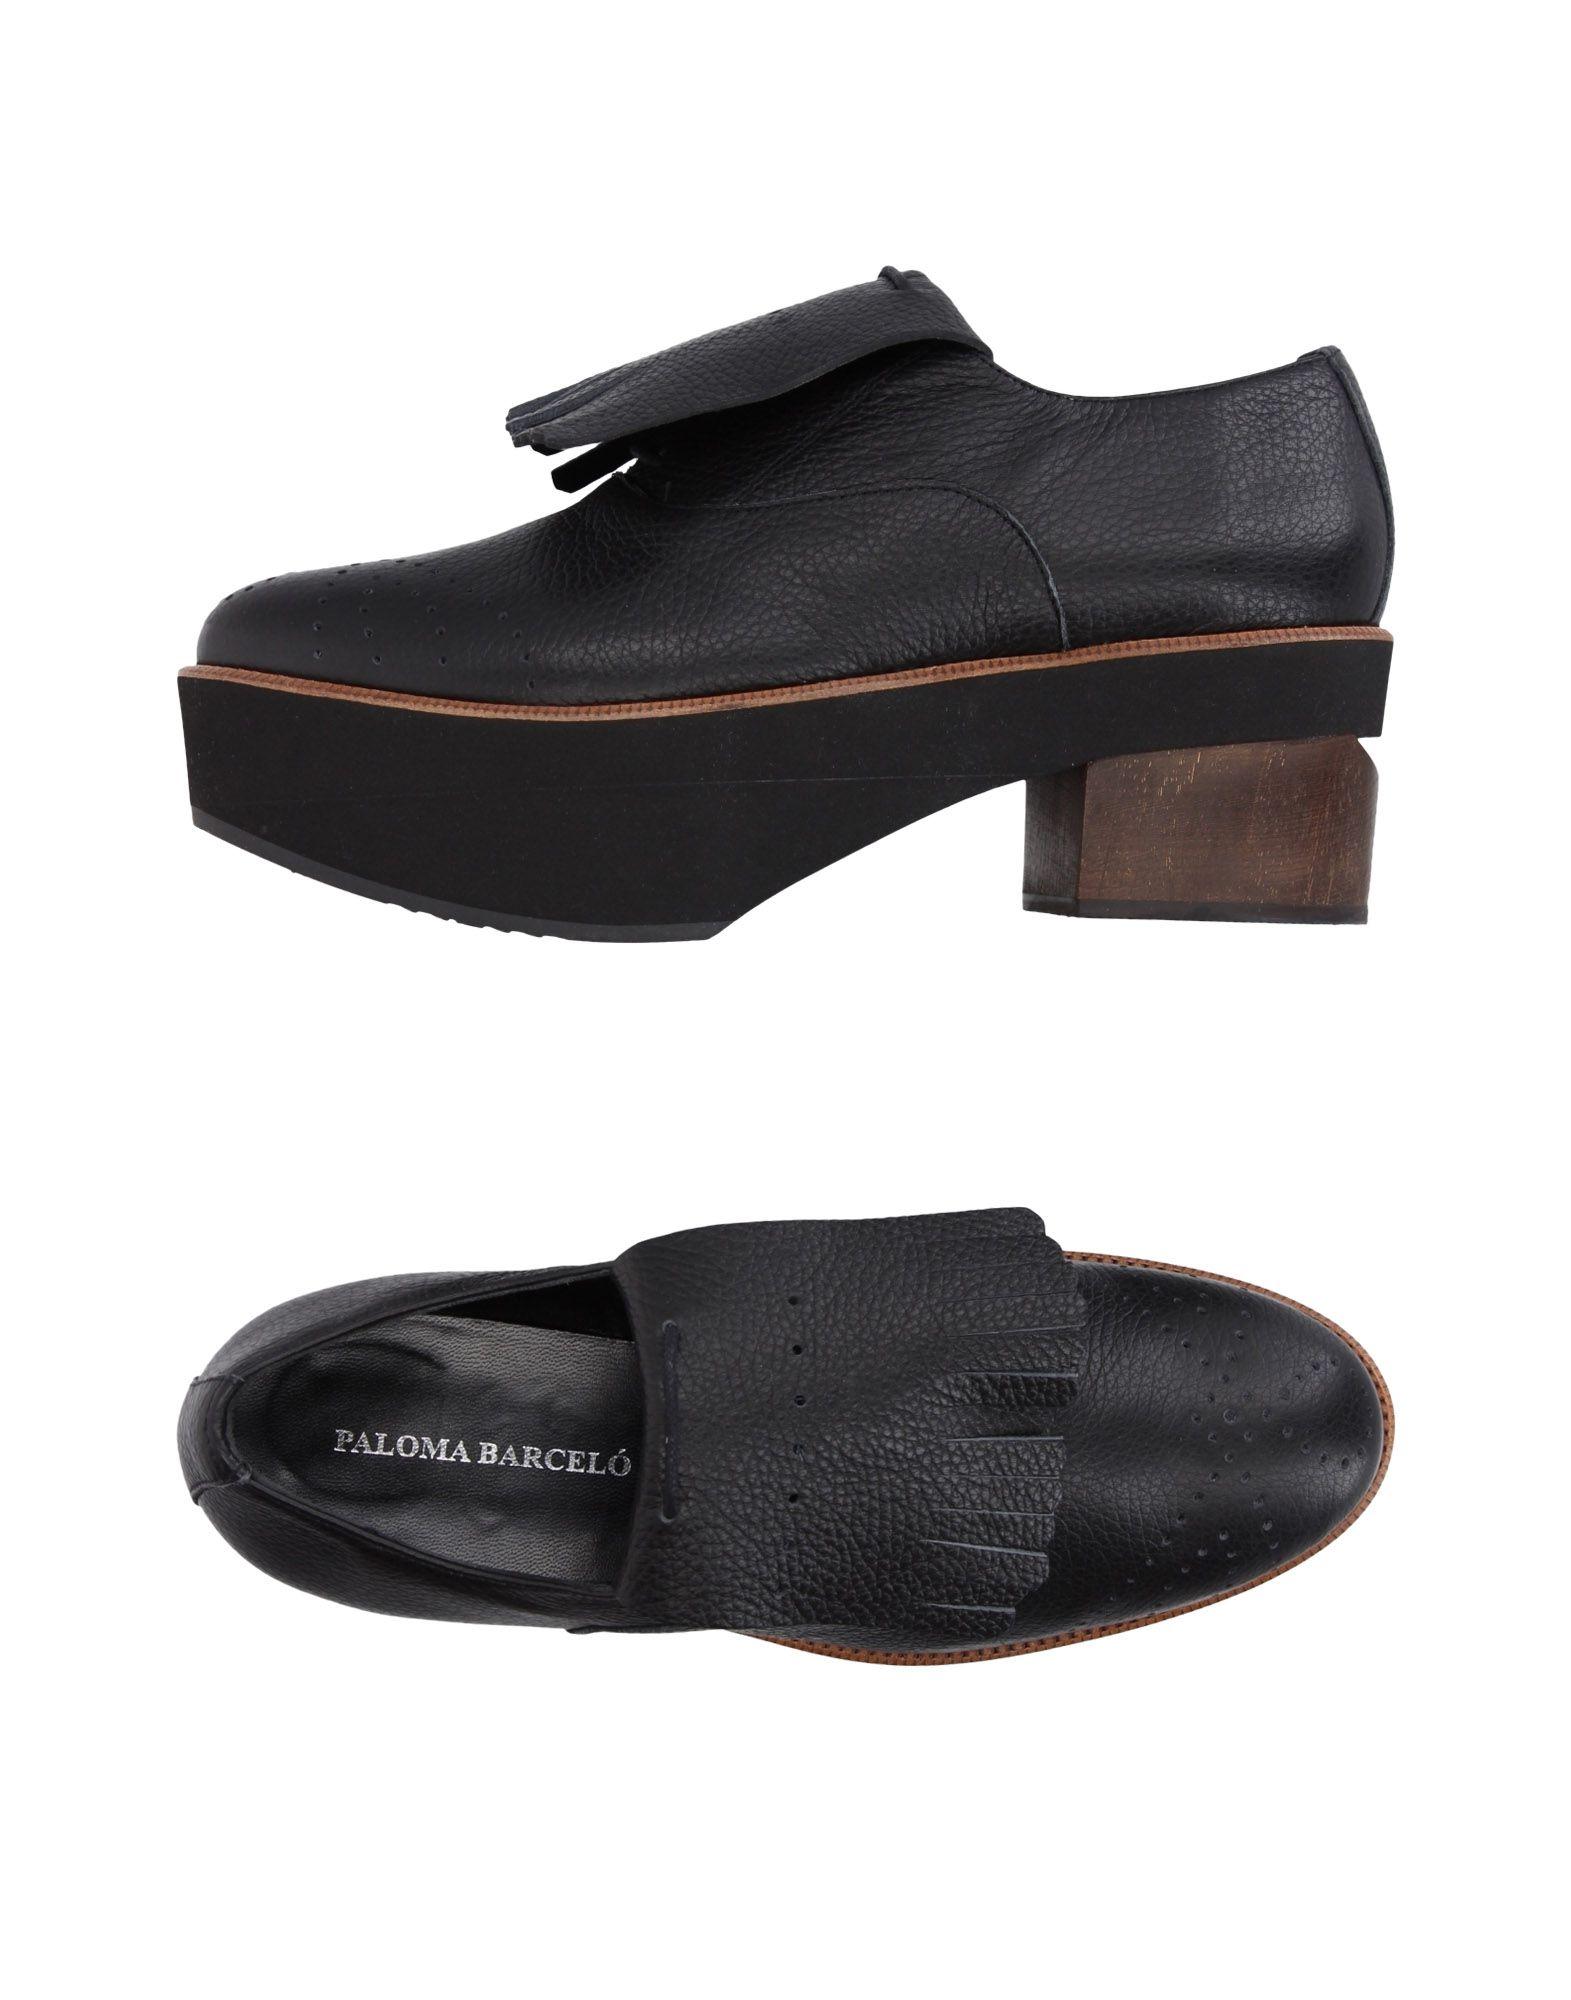 Stilvolle billige Schnürschuhe Schuhe Paloma Barceló Schnürschuhe billige Damen  11226903RN 6085fe